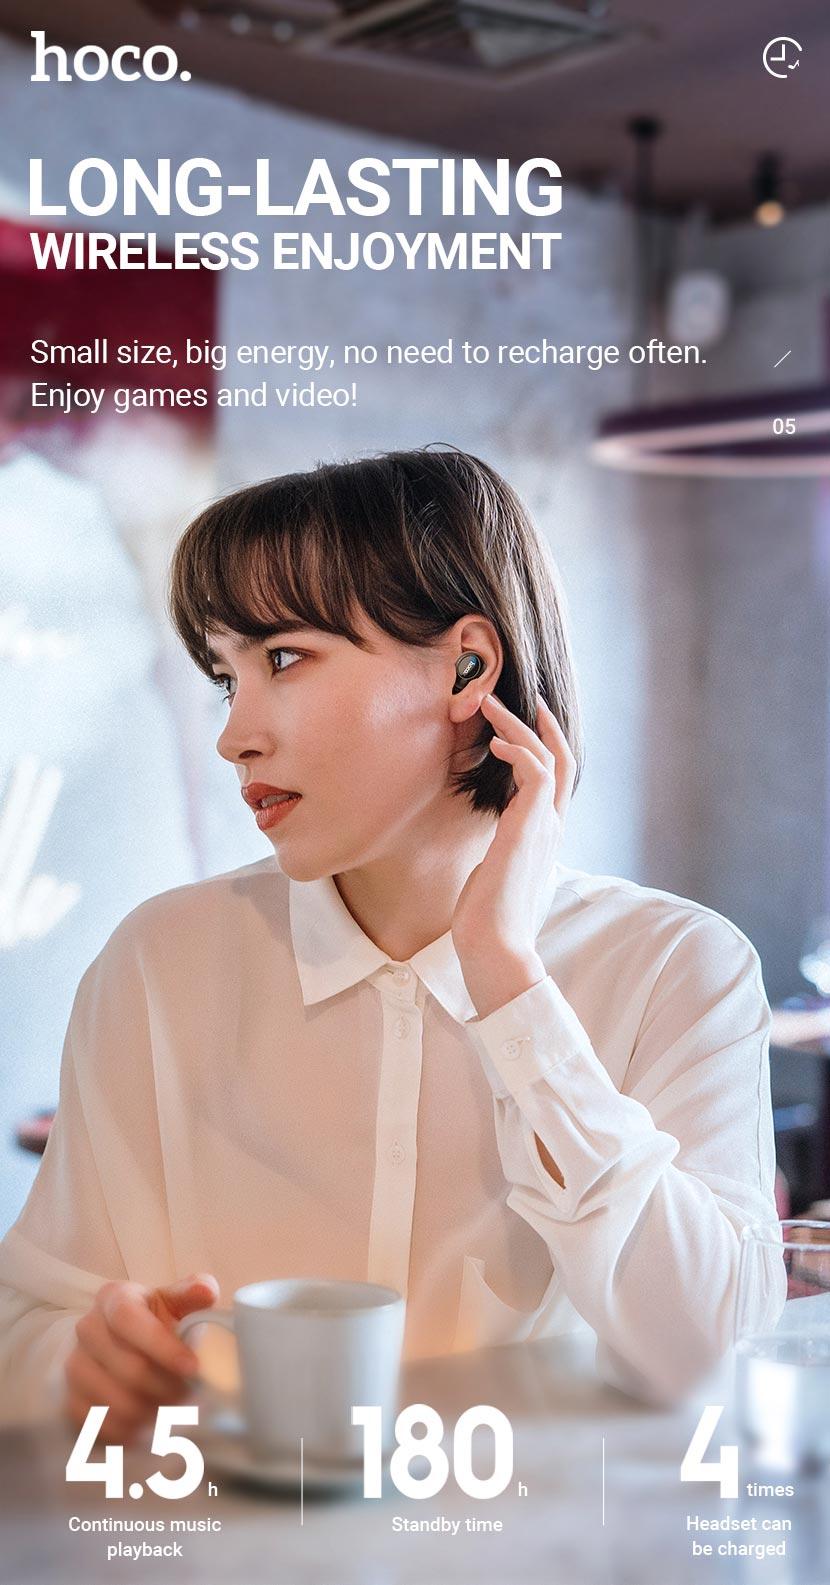 hoco news es52 delight tws wireless bt headset long lasting en